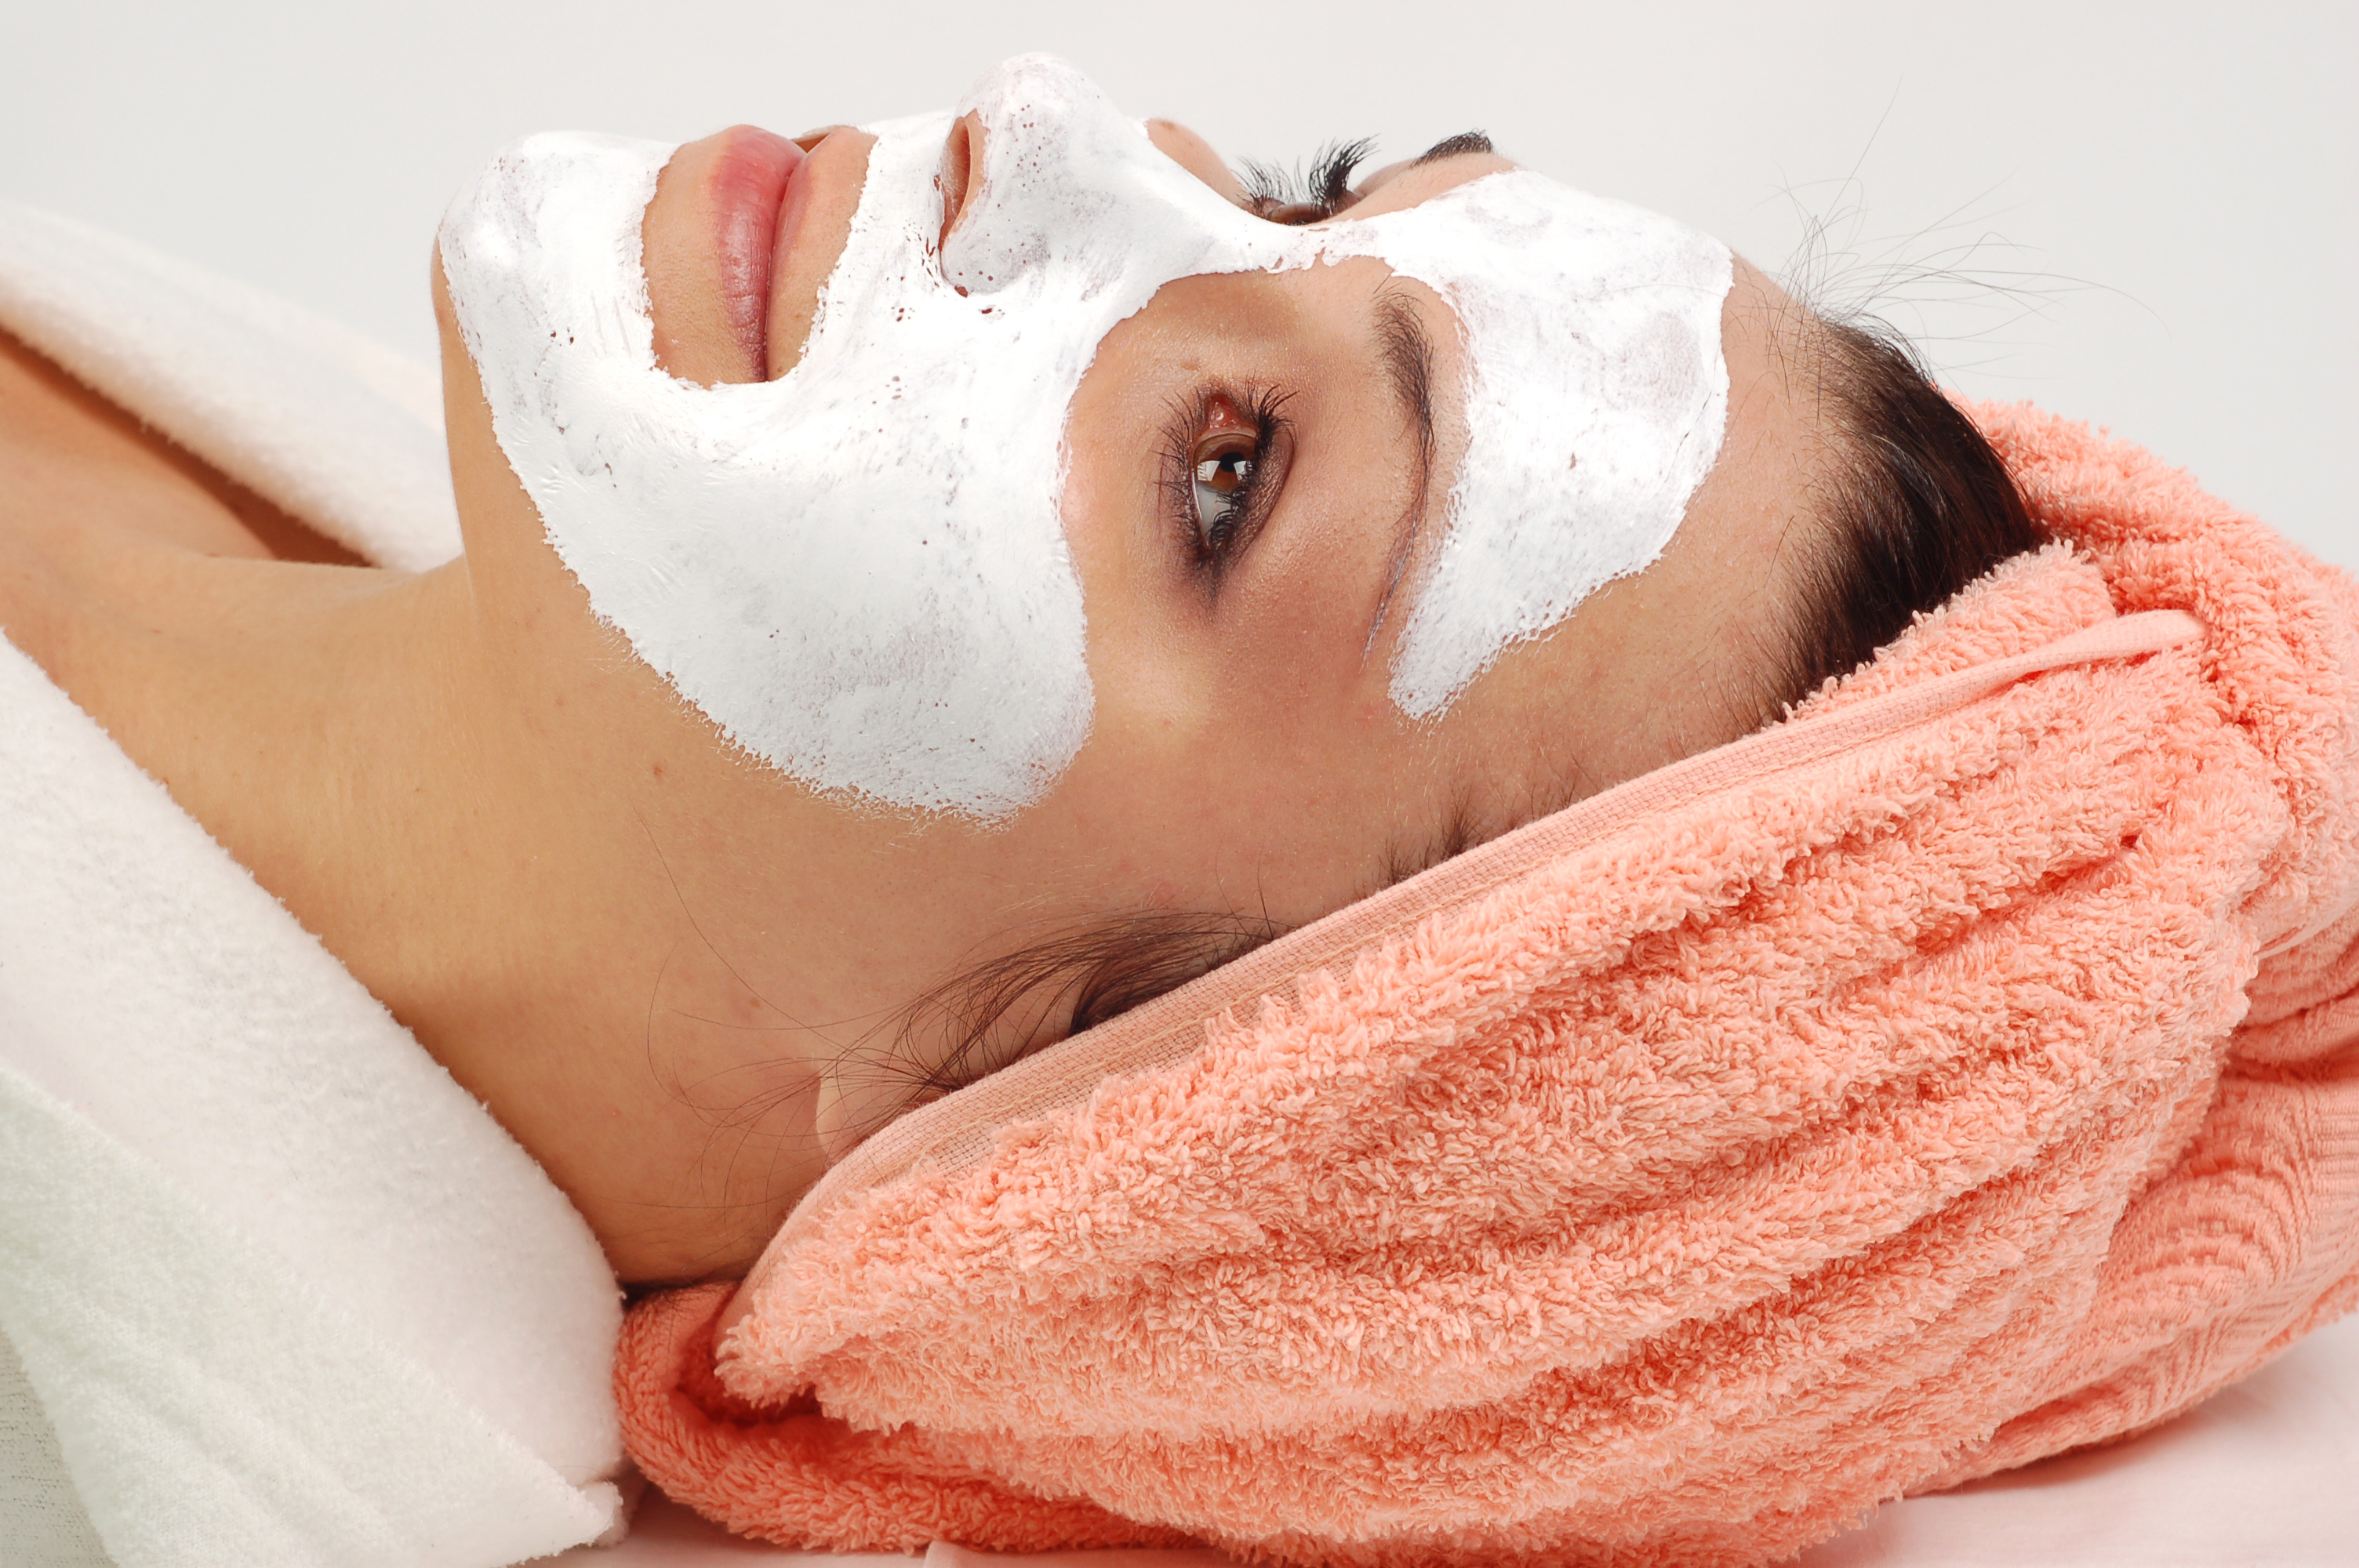 gelaatsverzorging gezichtverzorging